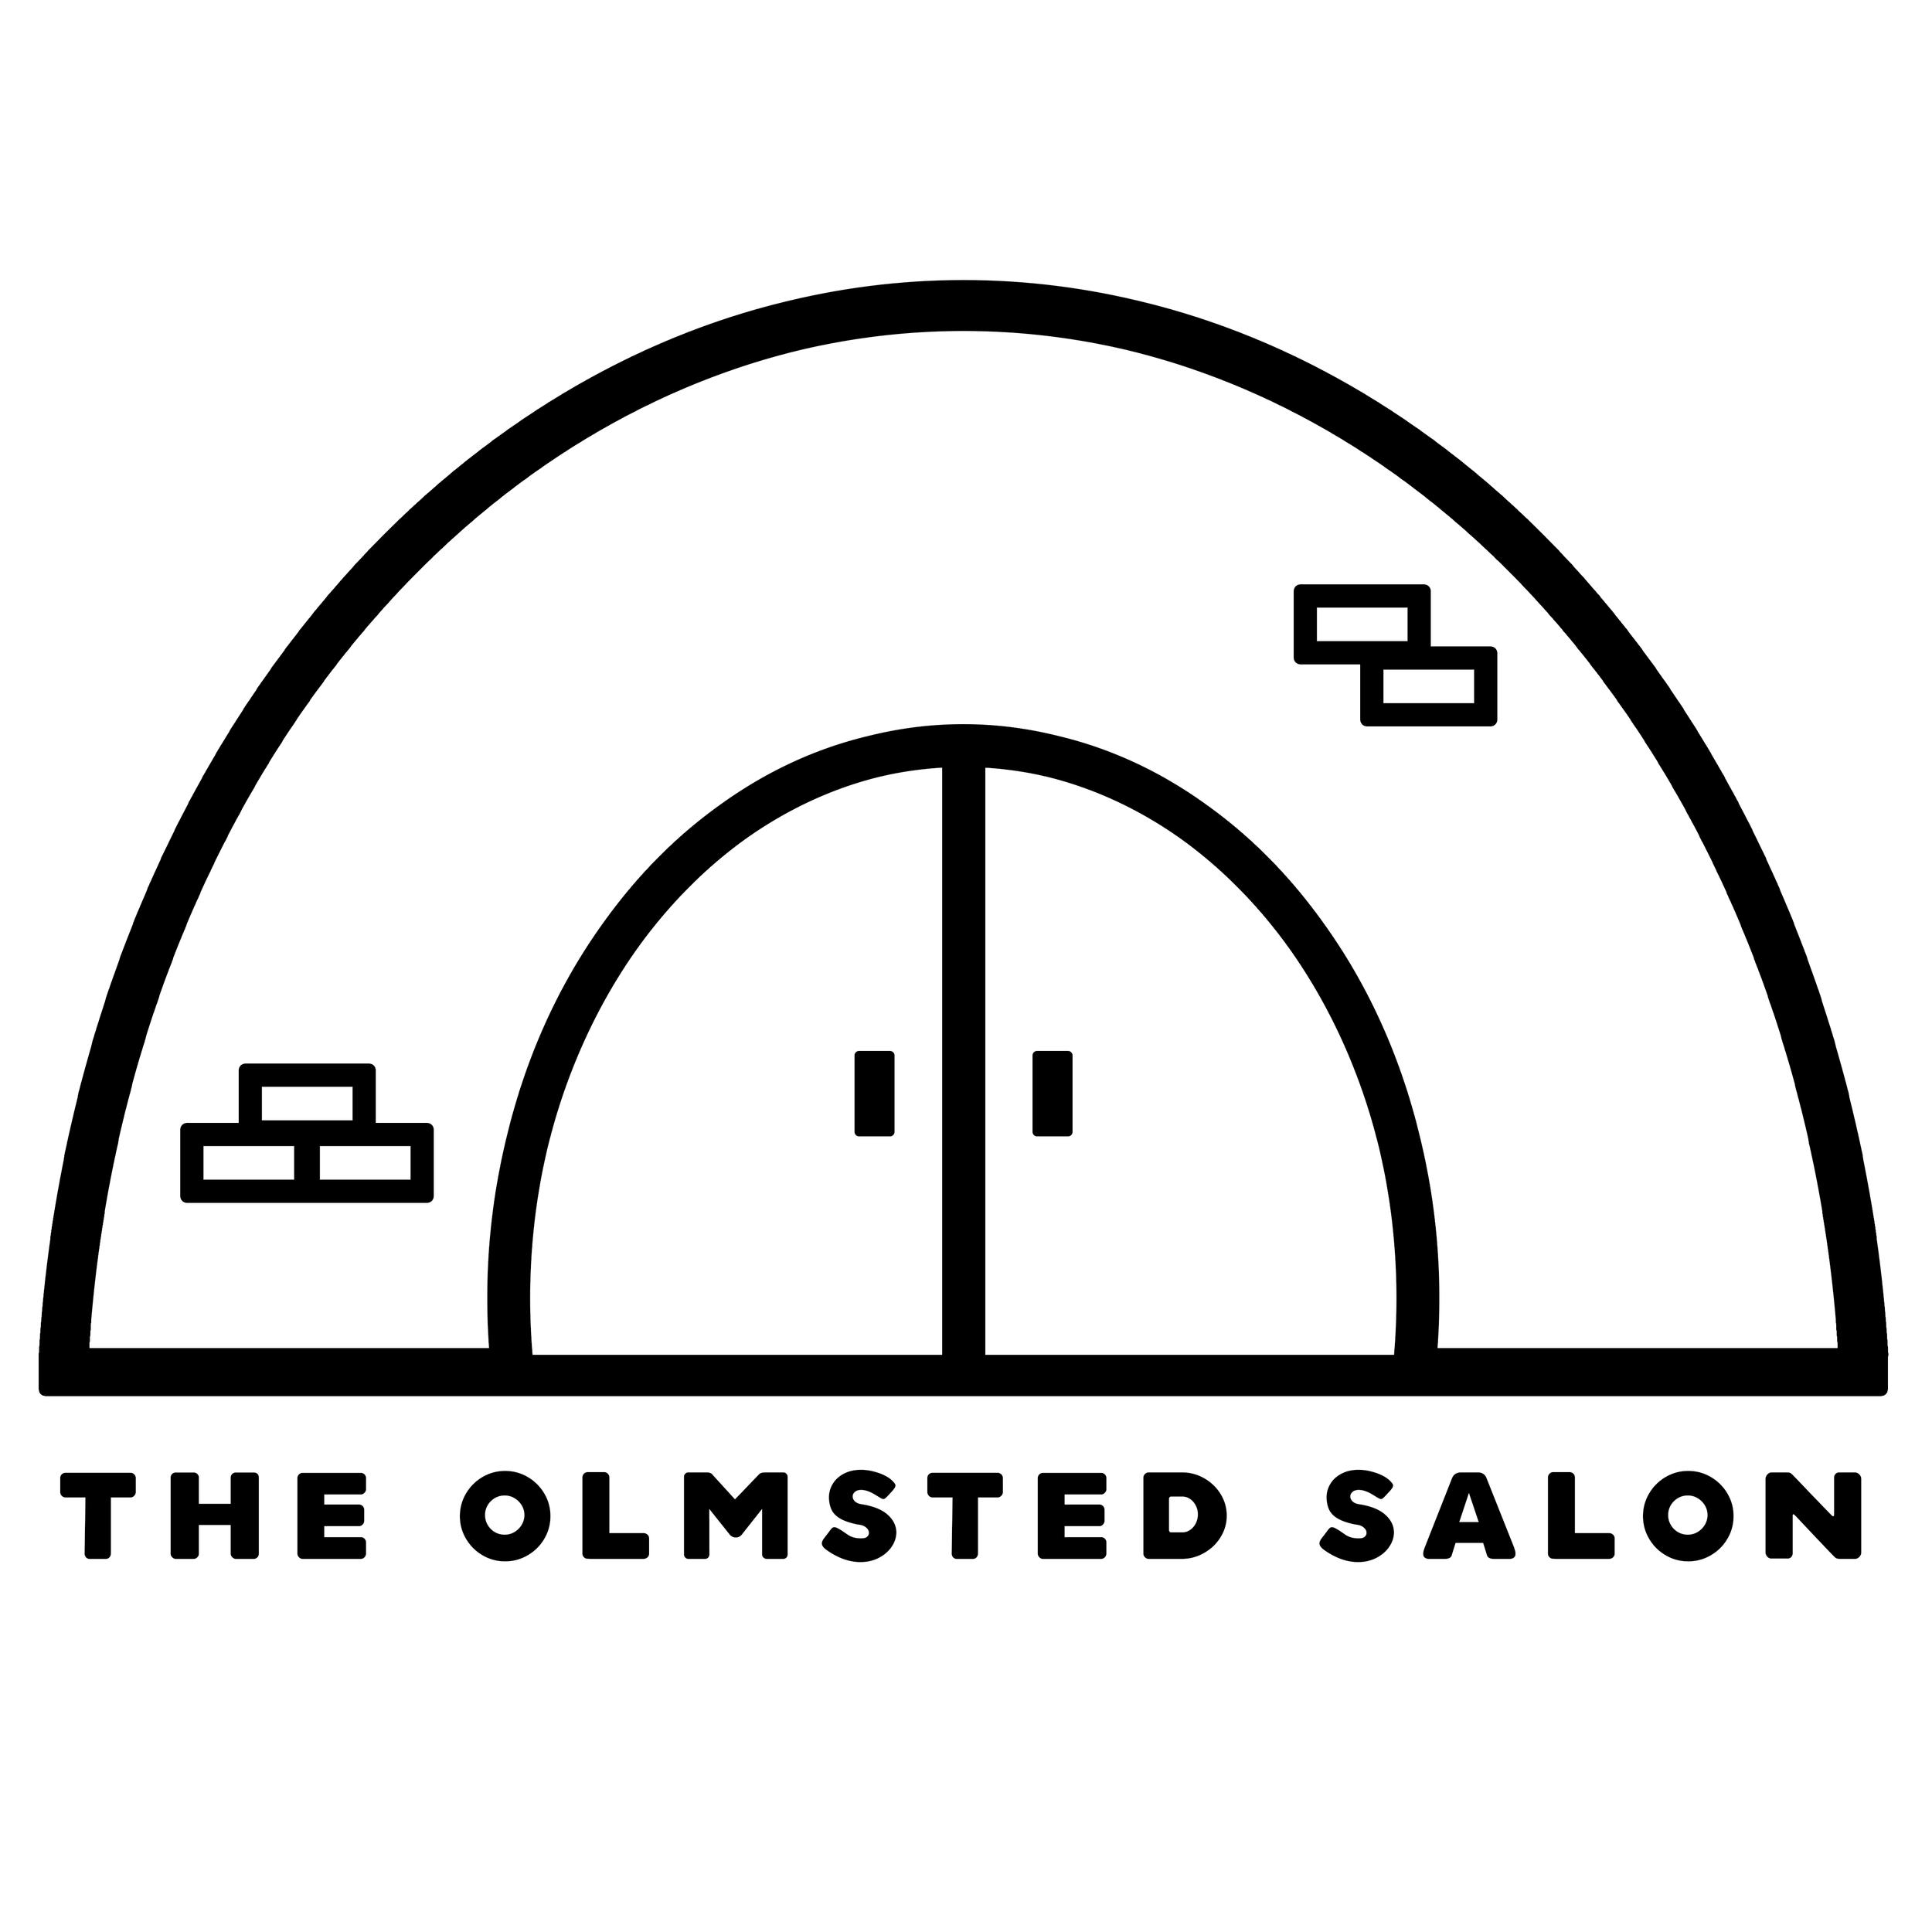 Logo_OlmstedSalon_2016.png